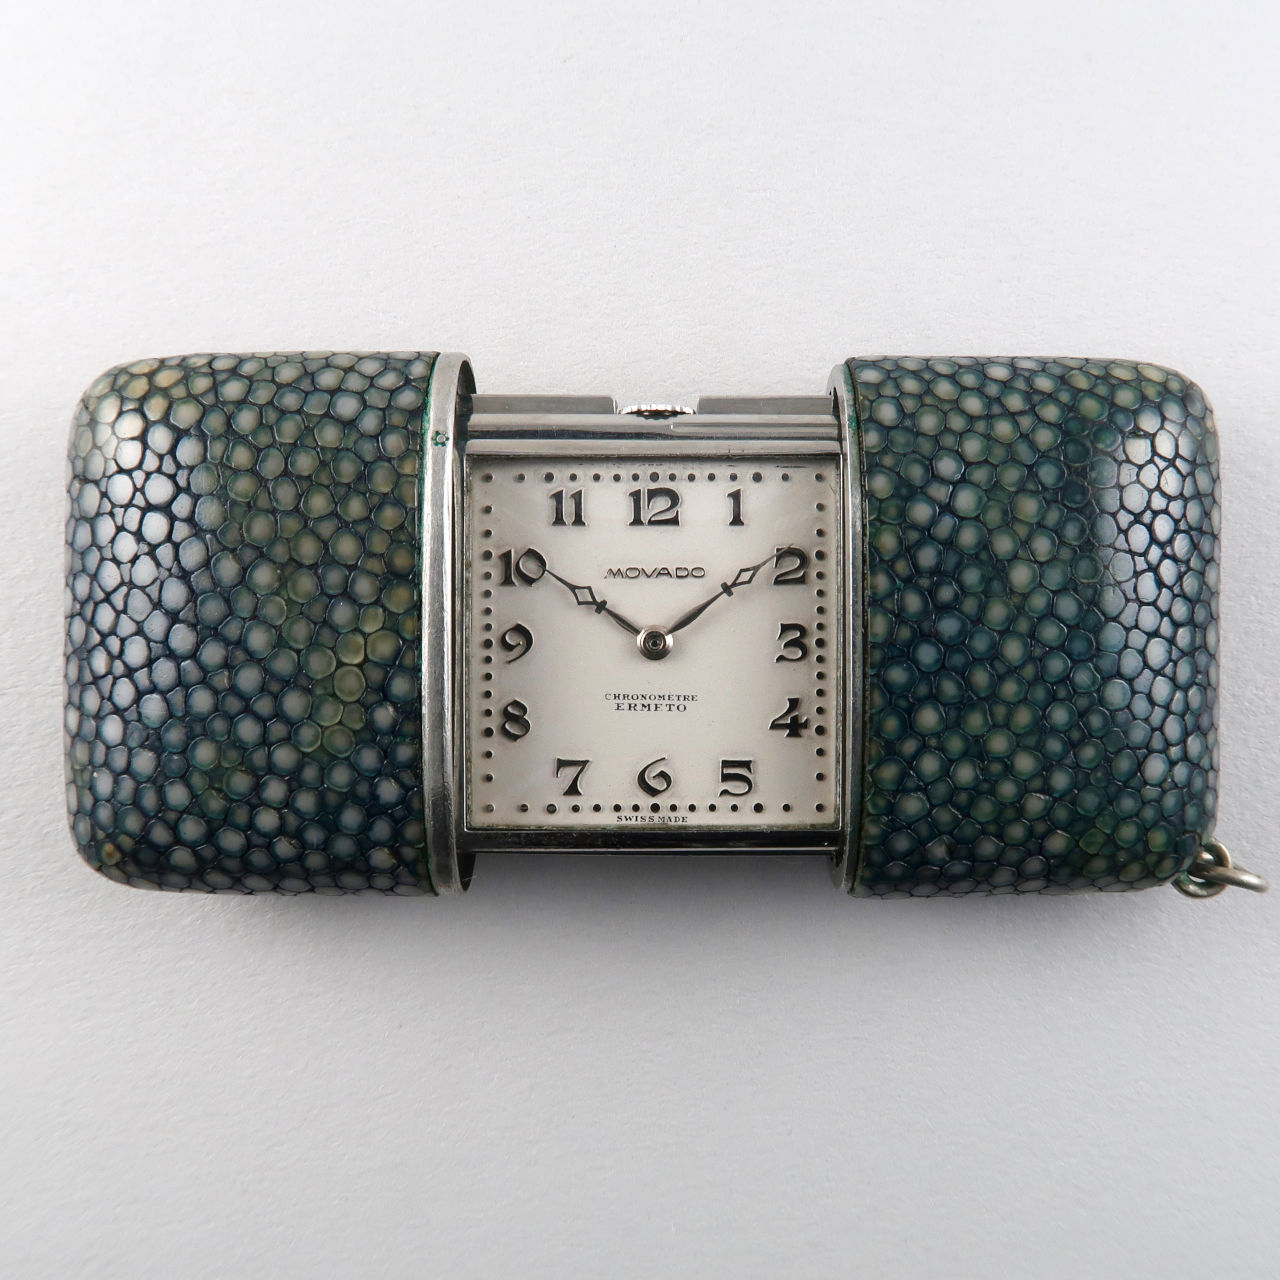 movado-ermeto-chronometre-circa-1930-blue-shagreen-steel-purse-watch-wymes-v01